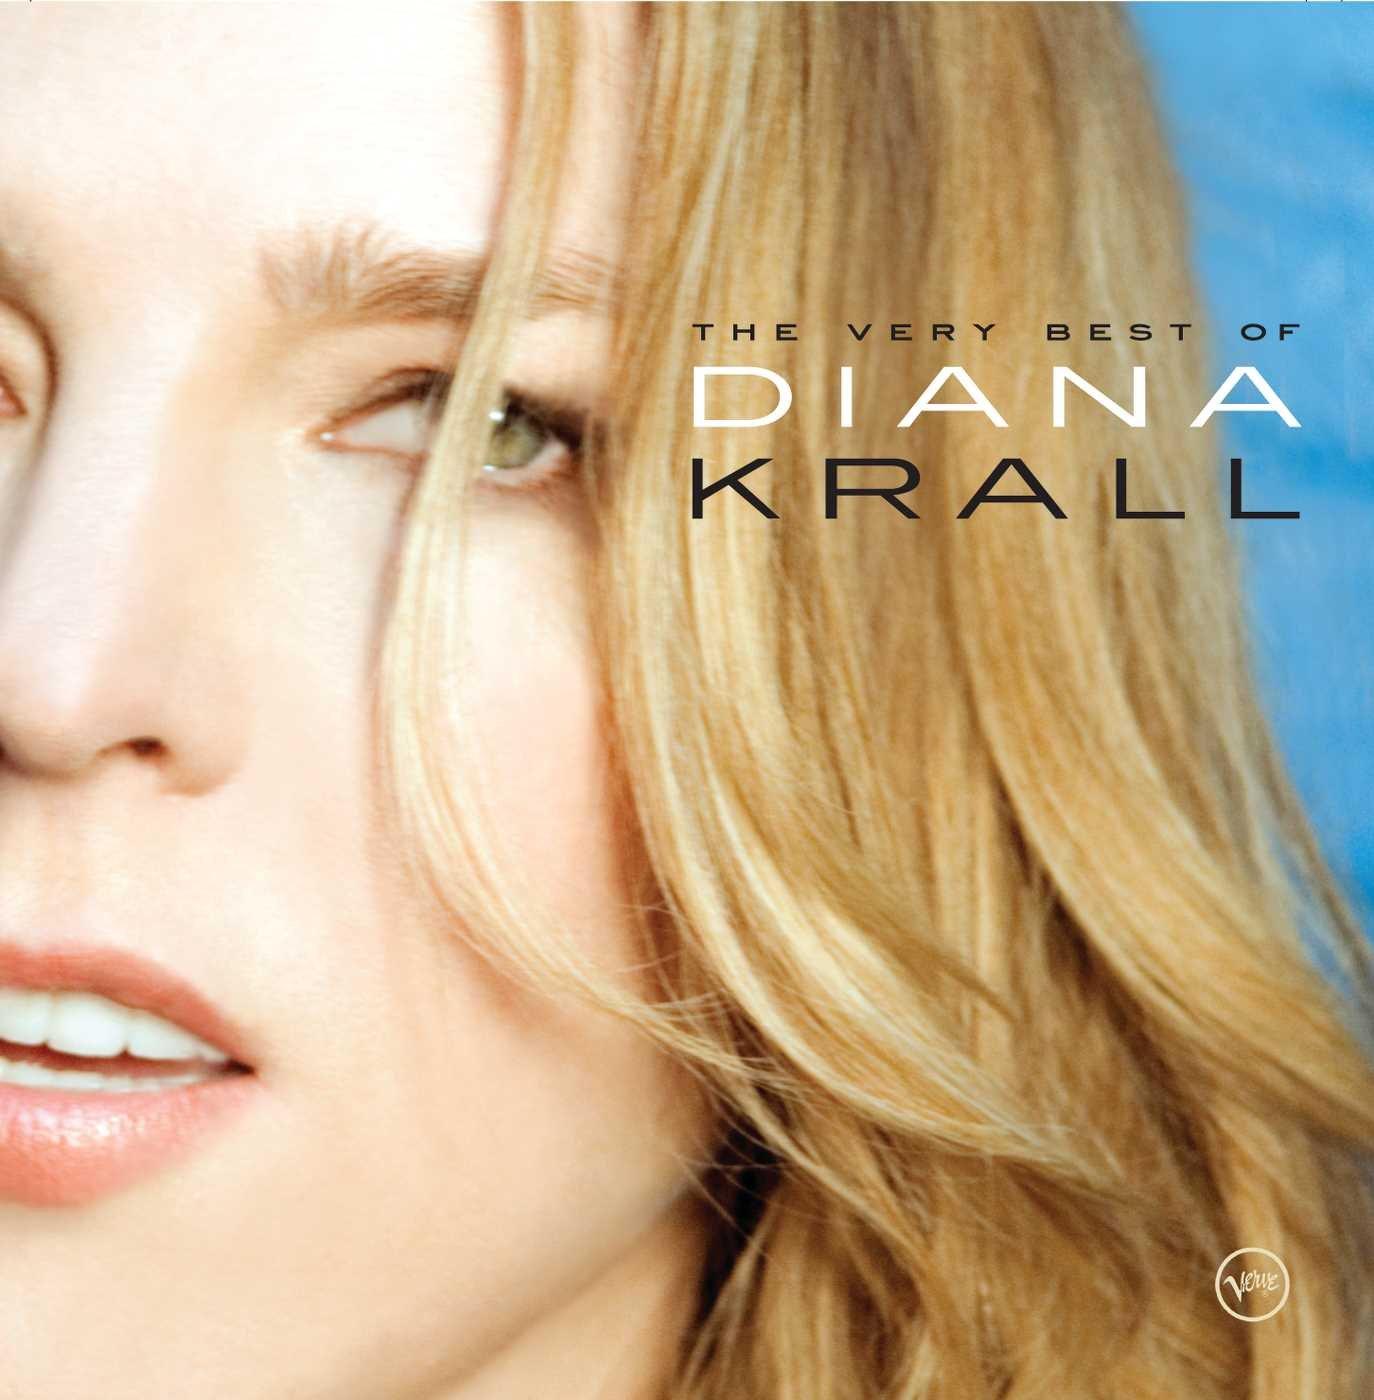 The Very Best of Diana Krall [Vinyl] by Verve